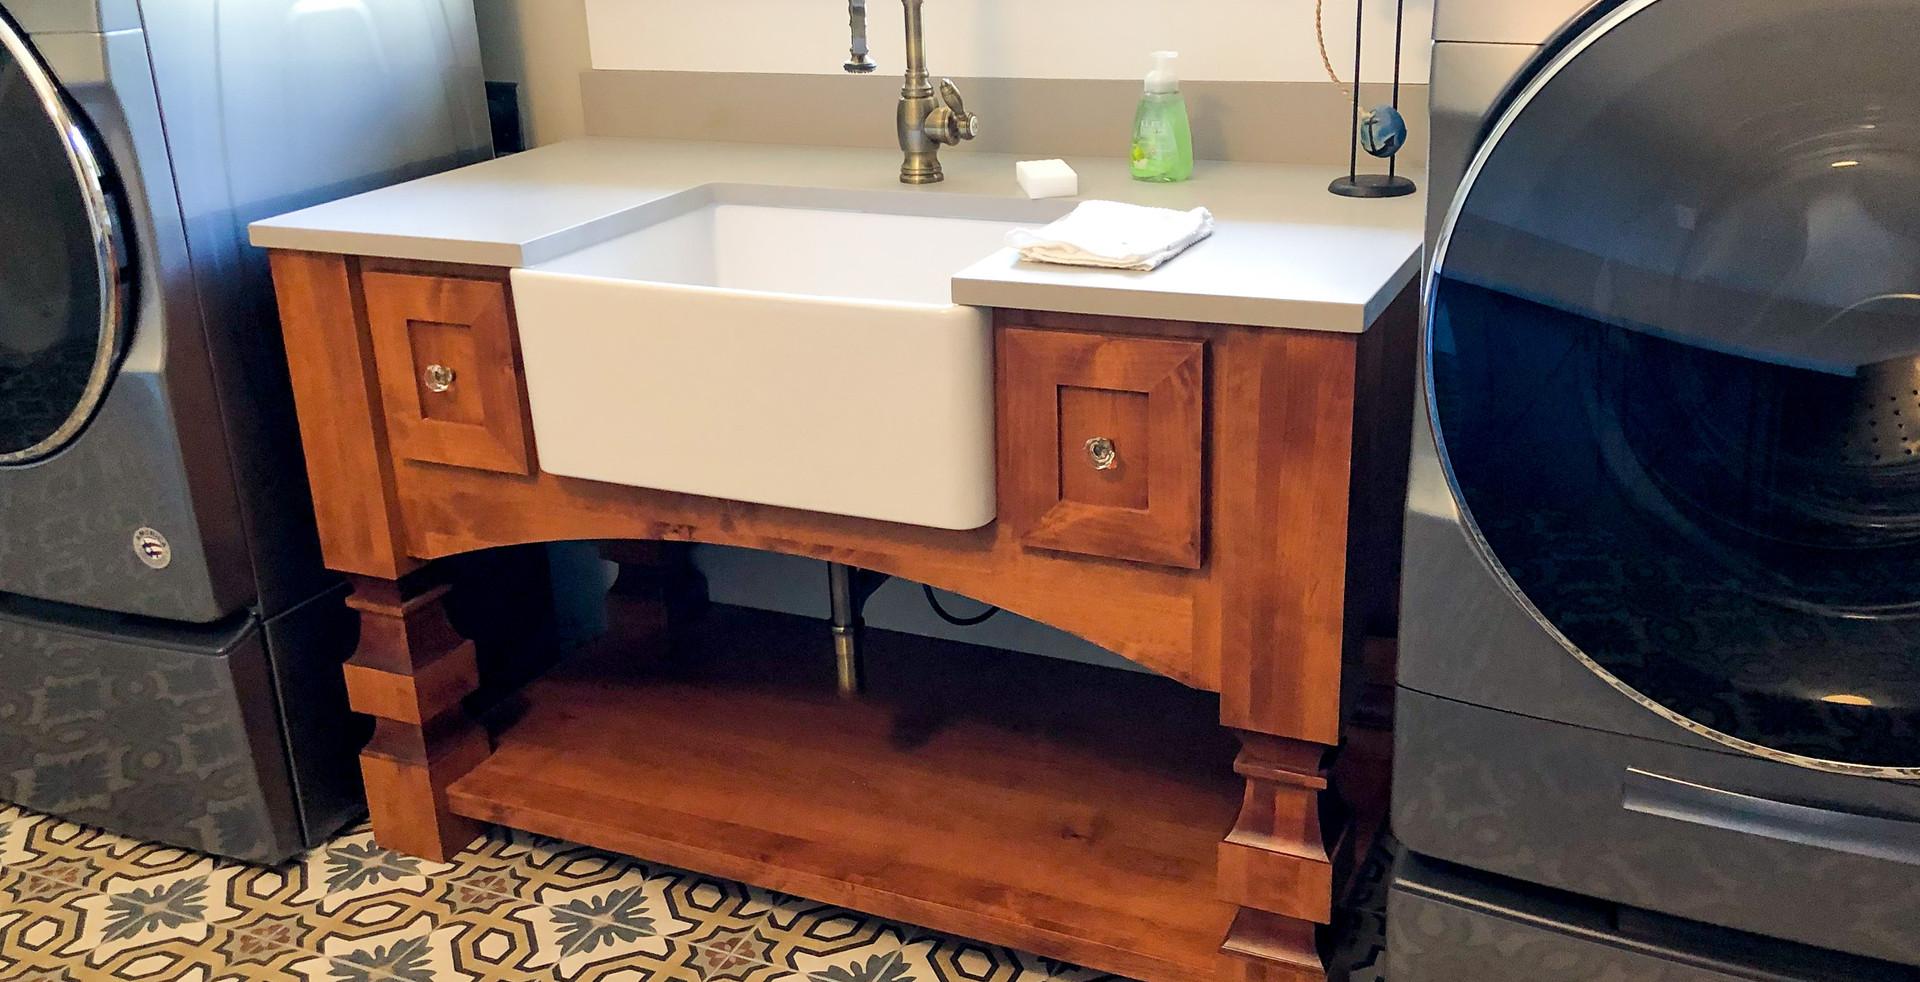 Sullivan's Laundry Room Cabinetry